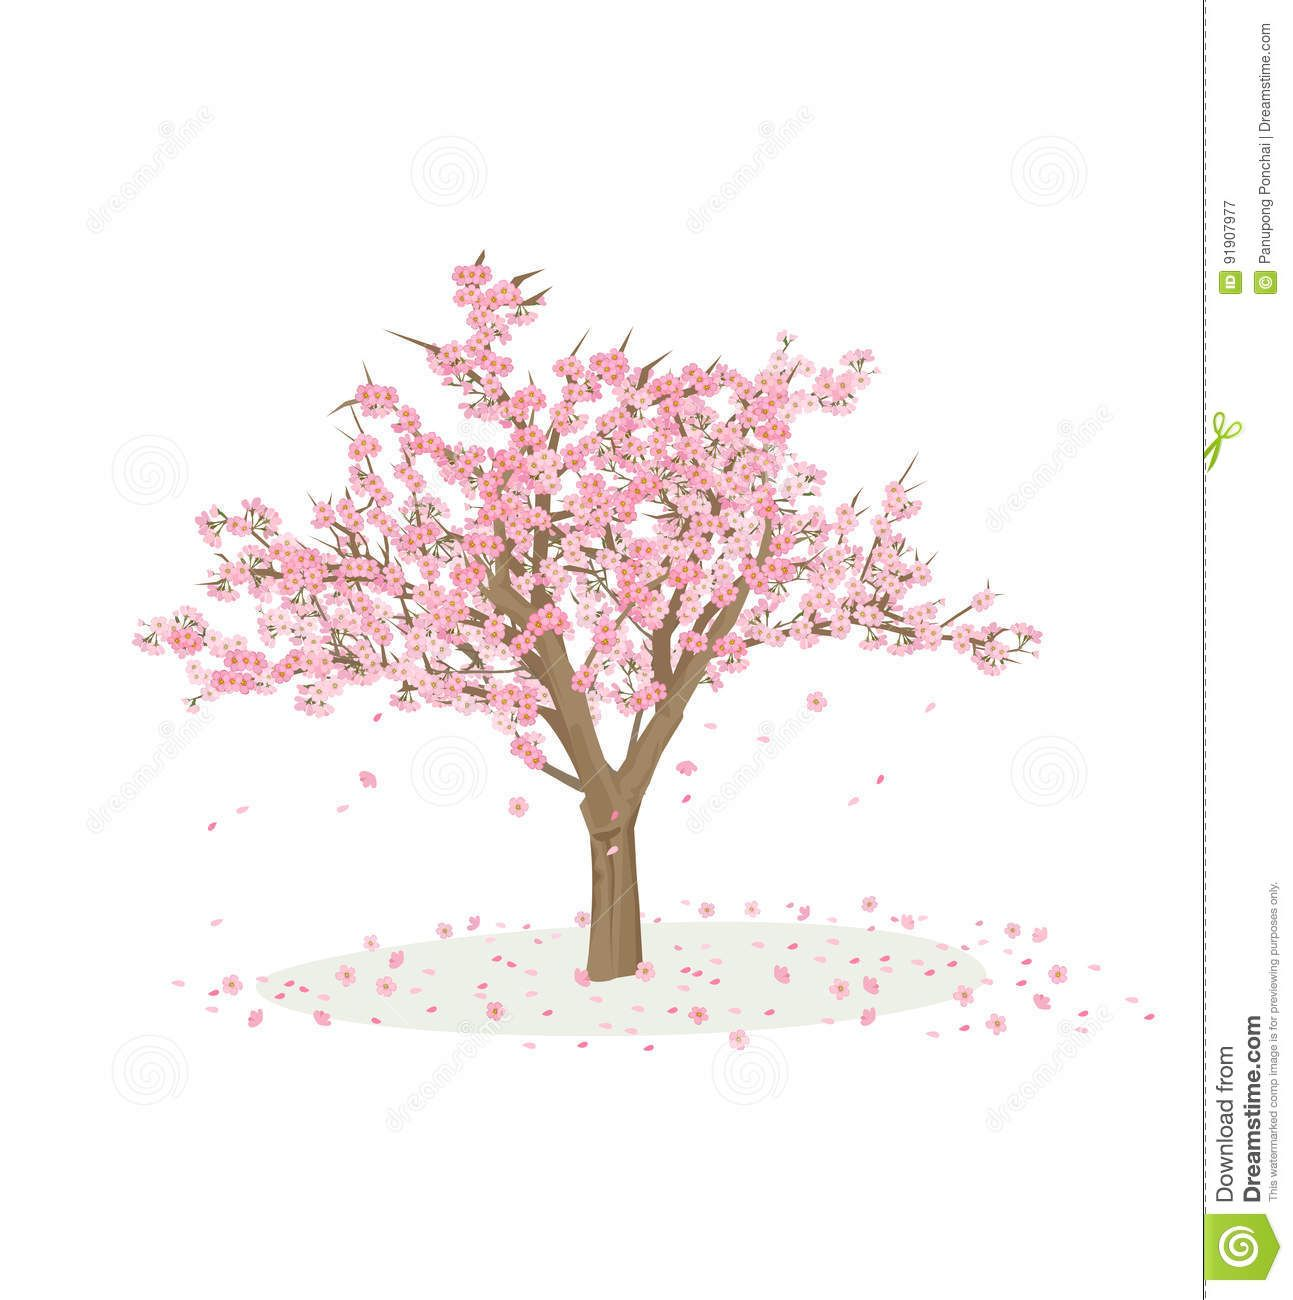 Cherry Blossom Tree Cartoon Google Search Blossom Trees Cherry Blossom Tree Cherry Blossom